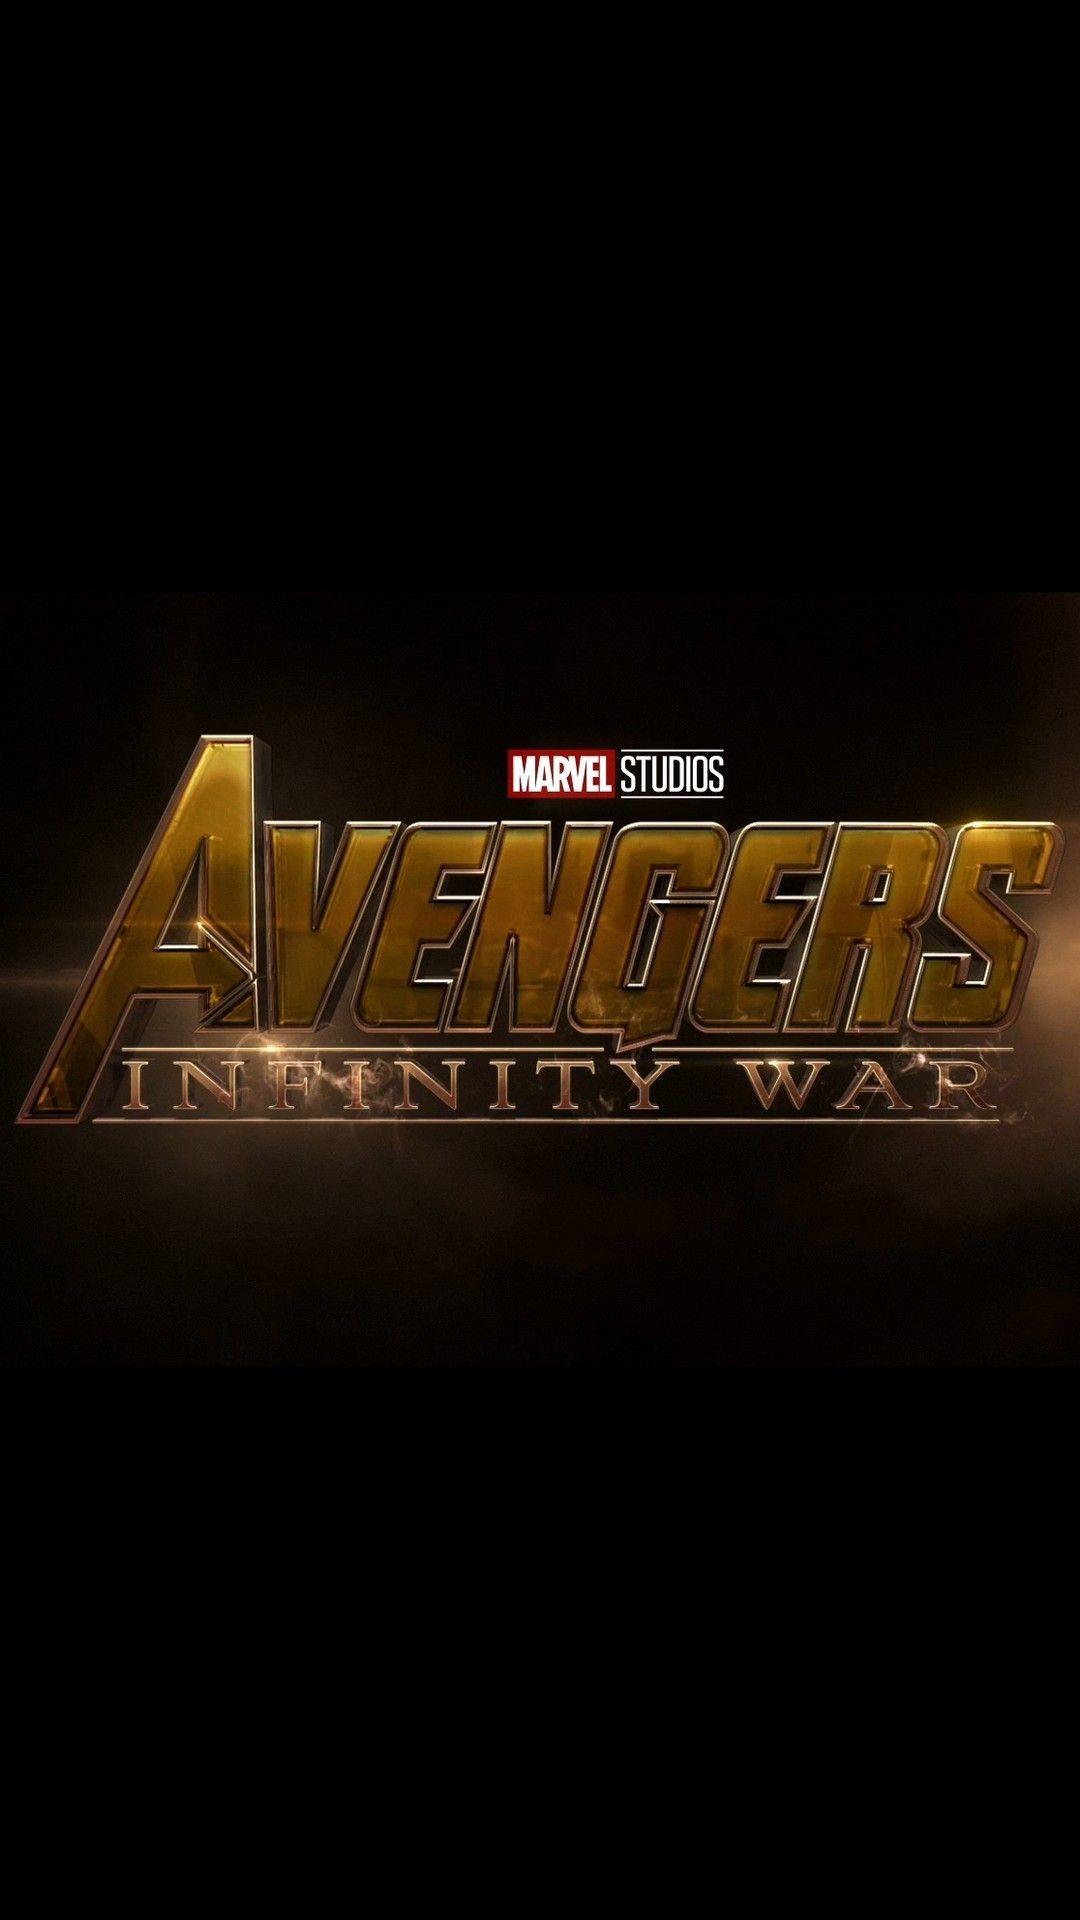 Res: 1080x1920, iPhone X Wallpaper Avengers Infinity War - Best iPhone Wallpaper